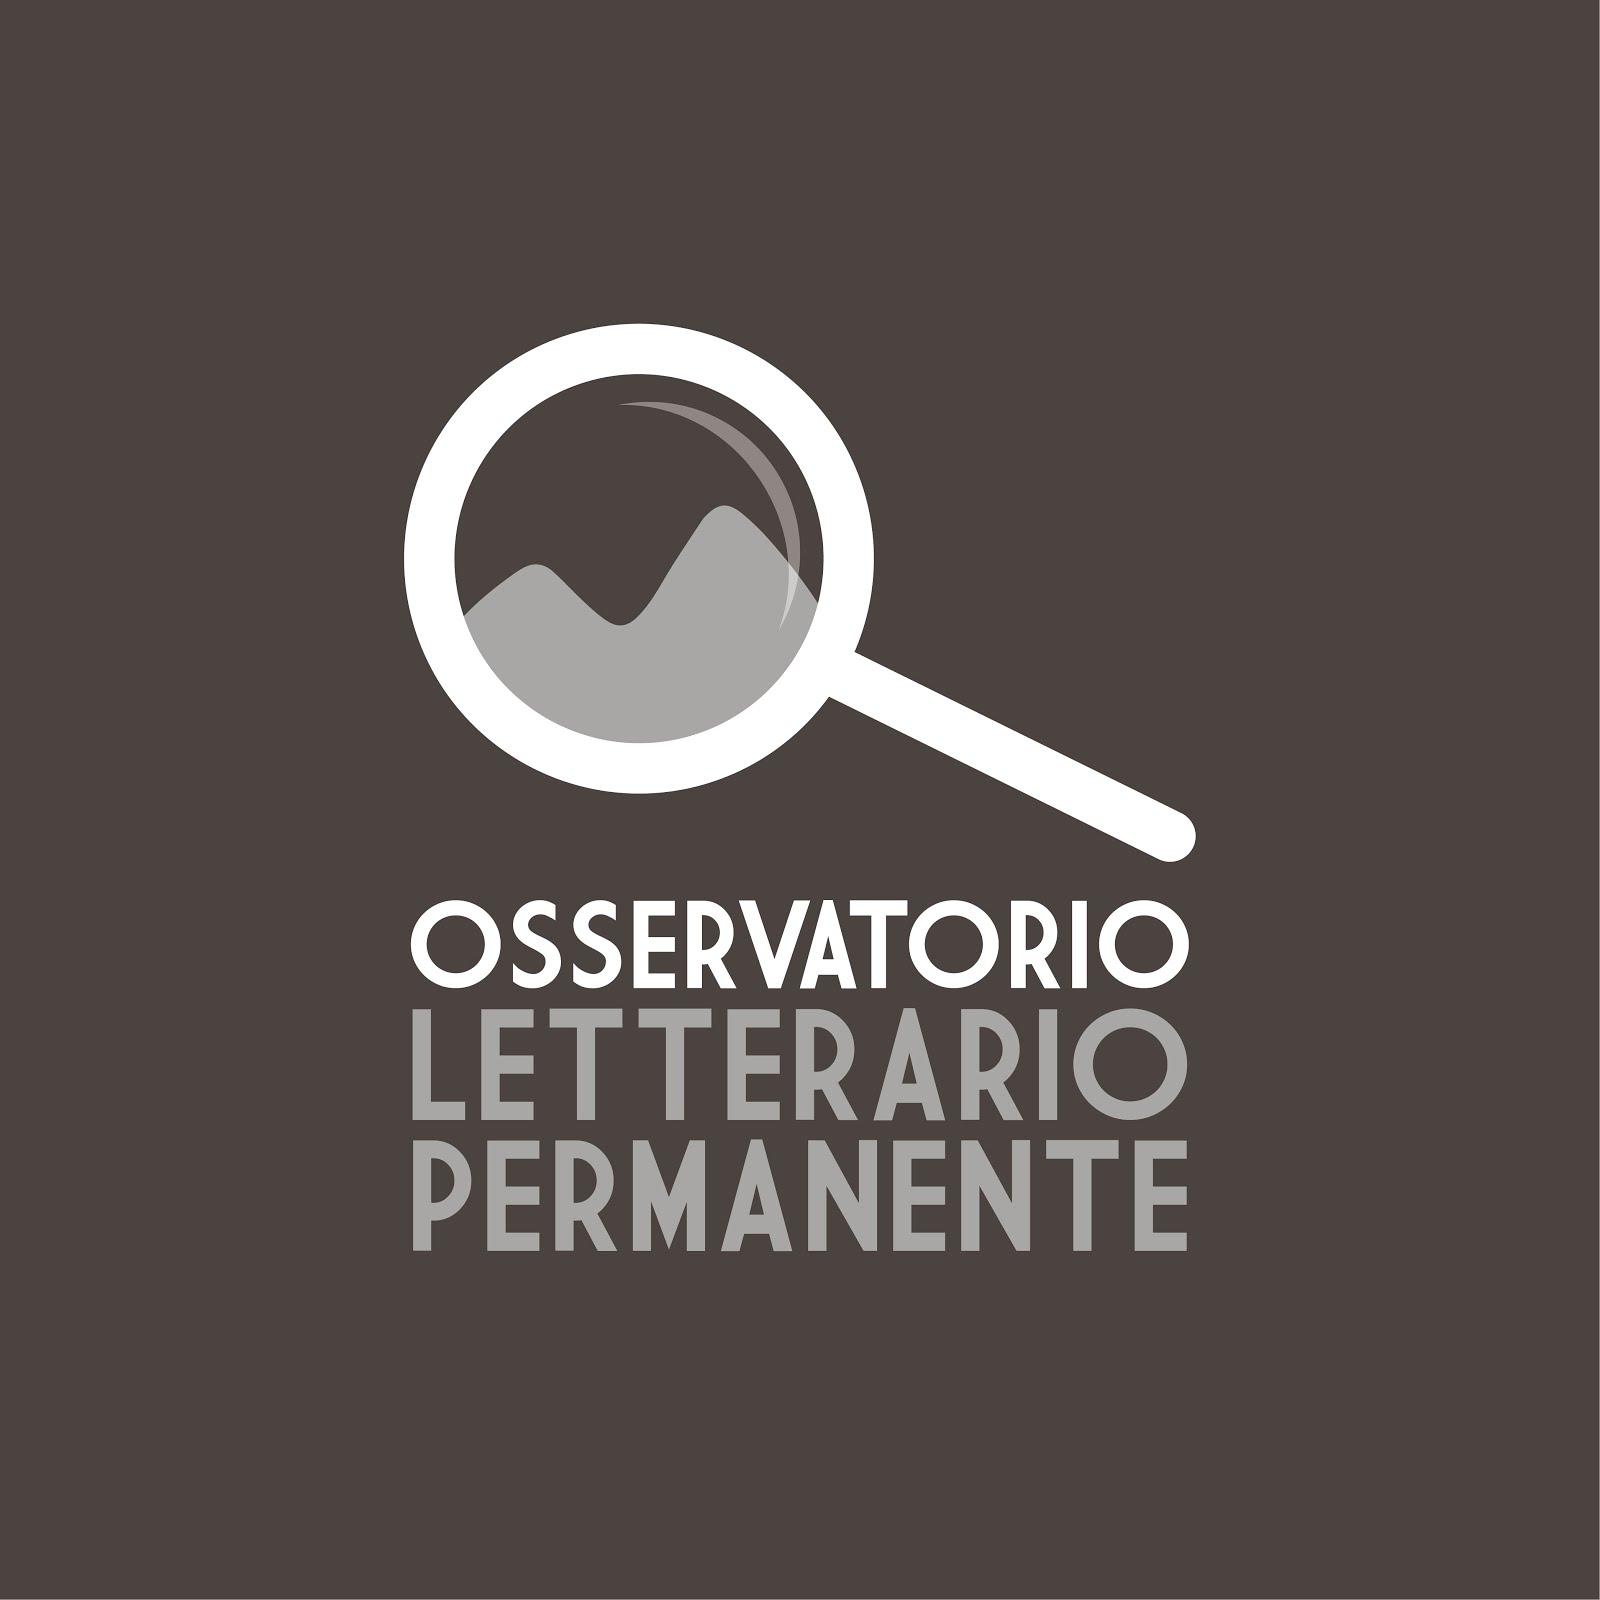 OSSERVATORIO LETTERARIO PERMANENTE